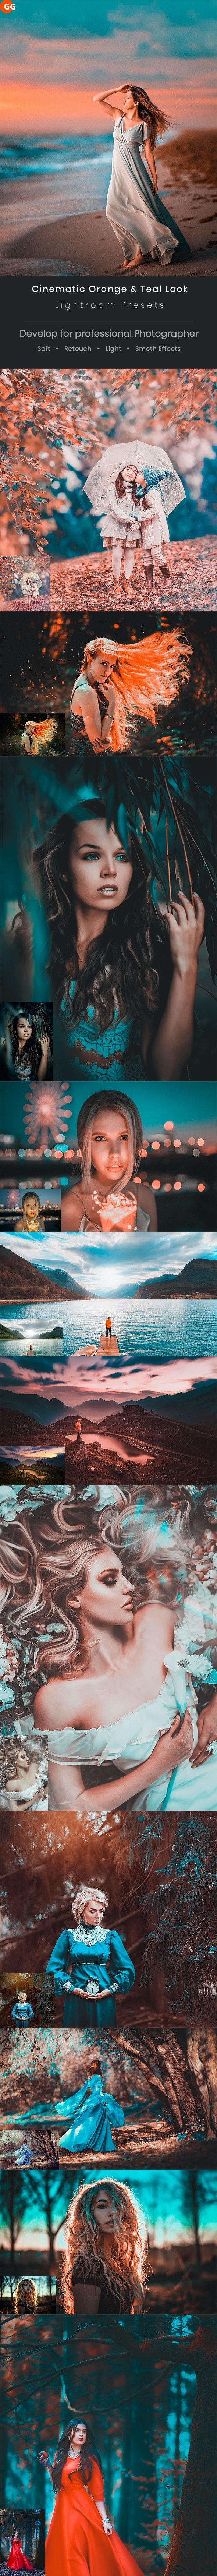 Cinematic Orange & Teal Look Lightroom Preset - Cinematic Lightroom Presets